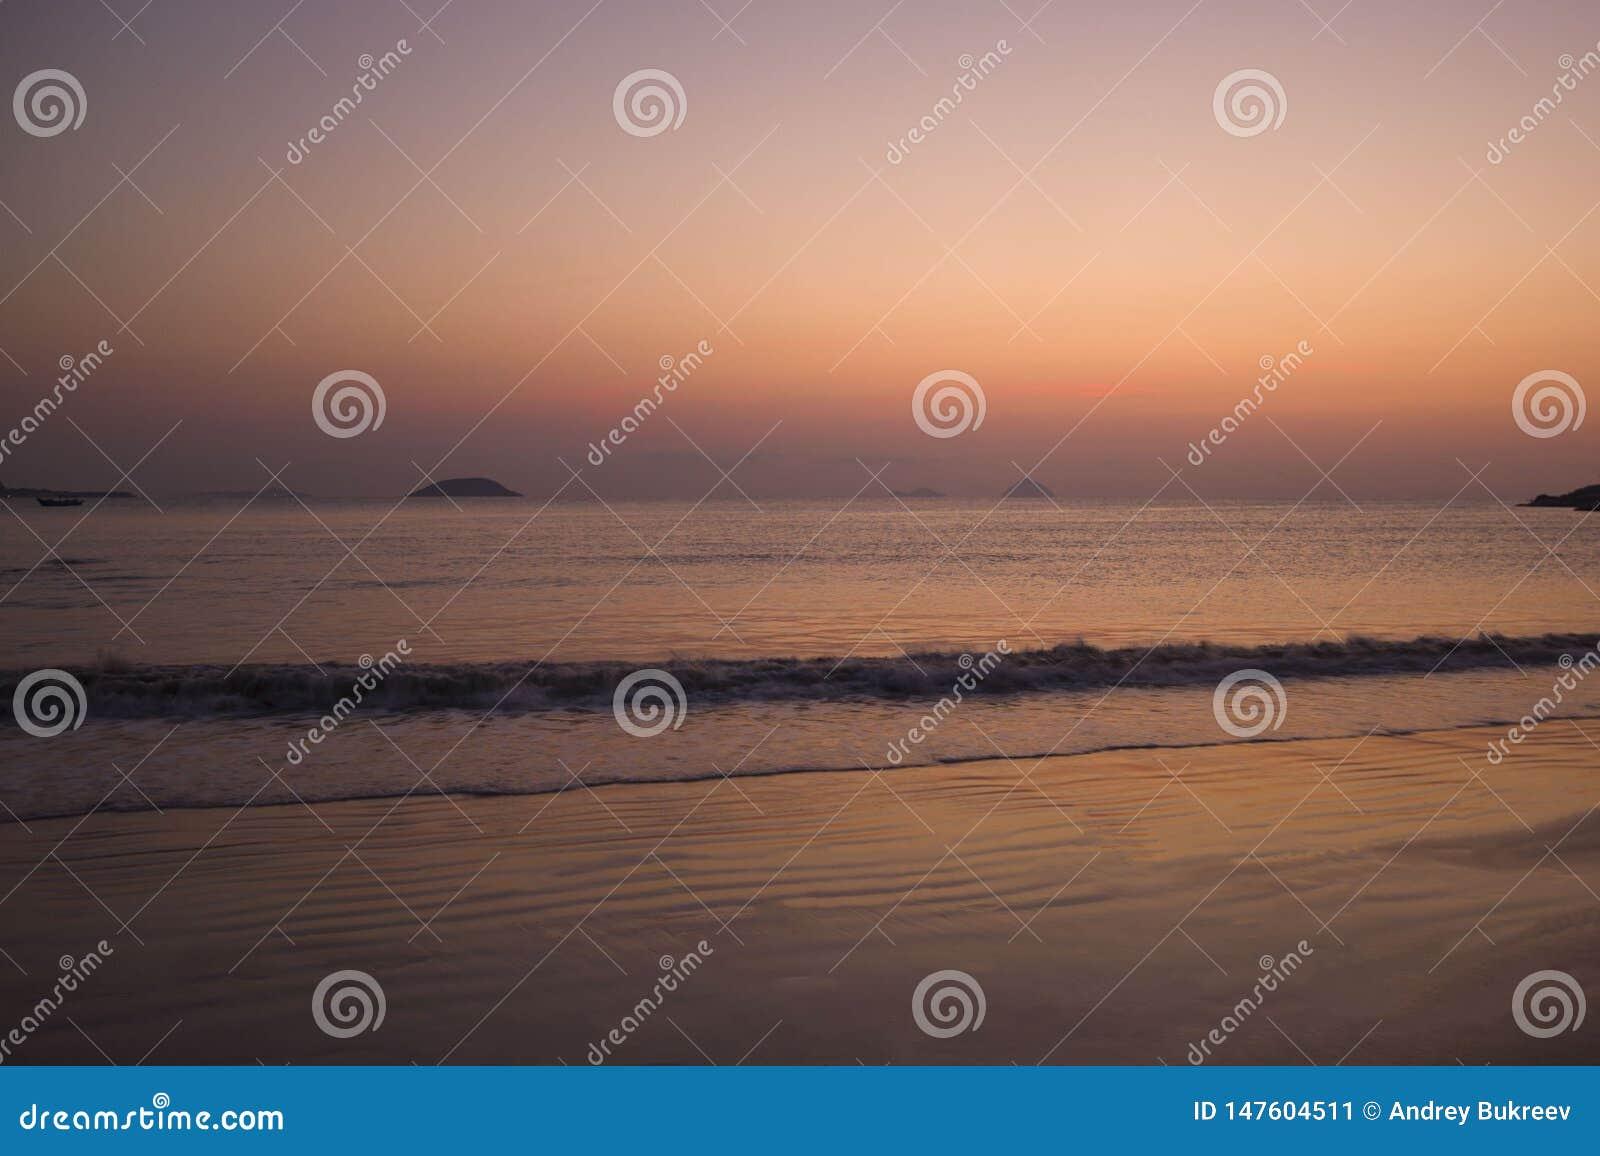 Sea beach at sunrise and sunset